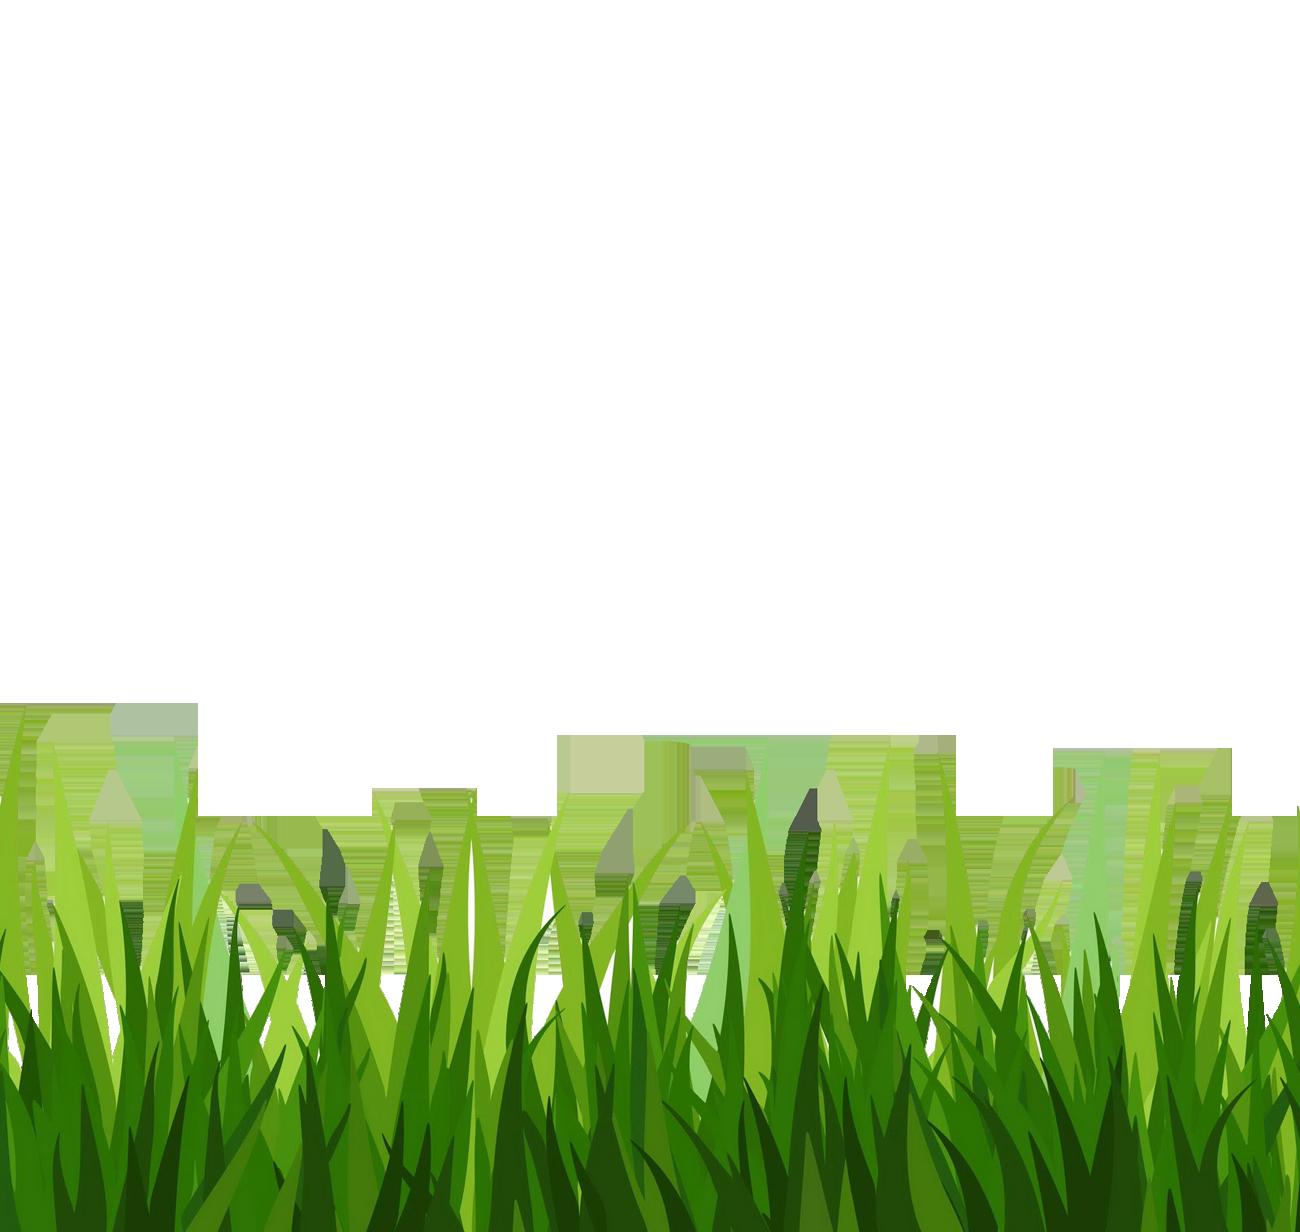 Grass clip art free free clipart images 2 Grass clipart